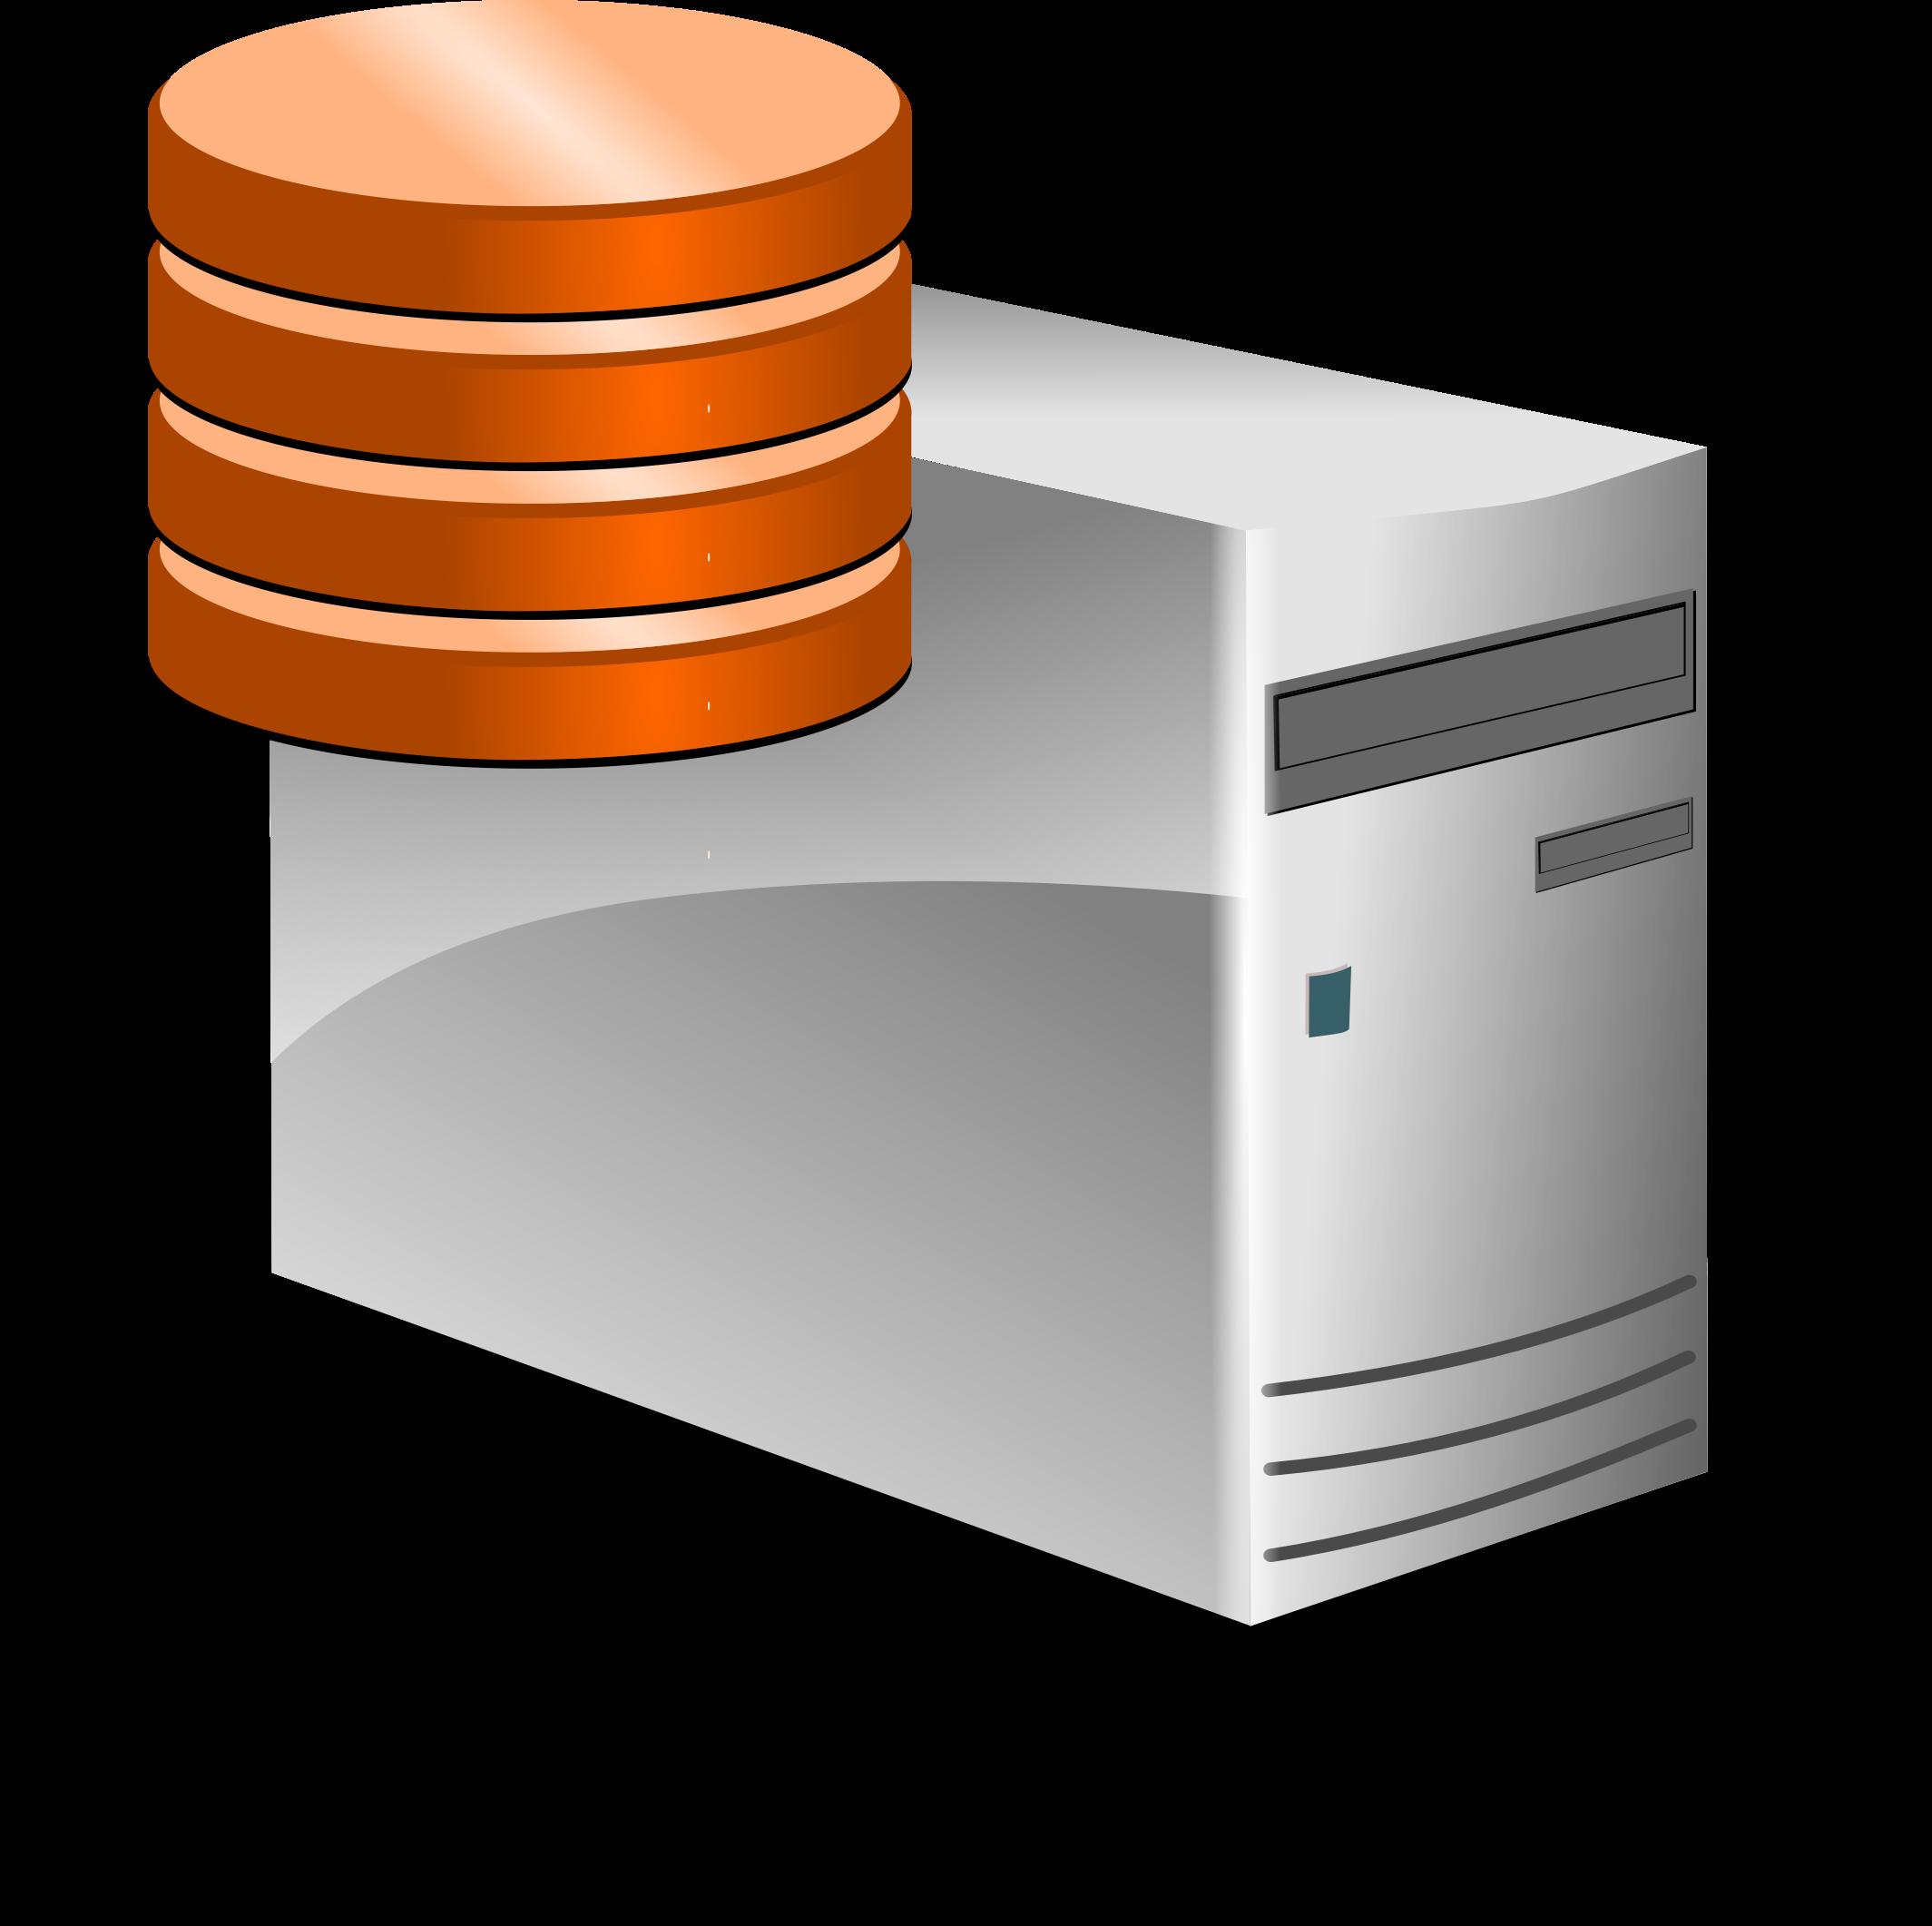 SQL Database Clip Art.